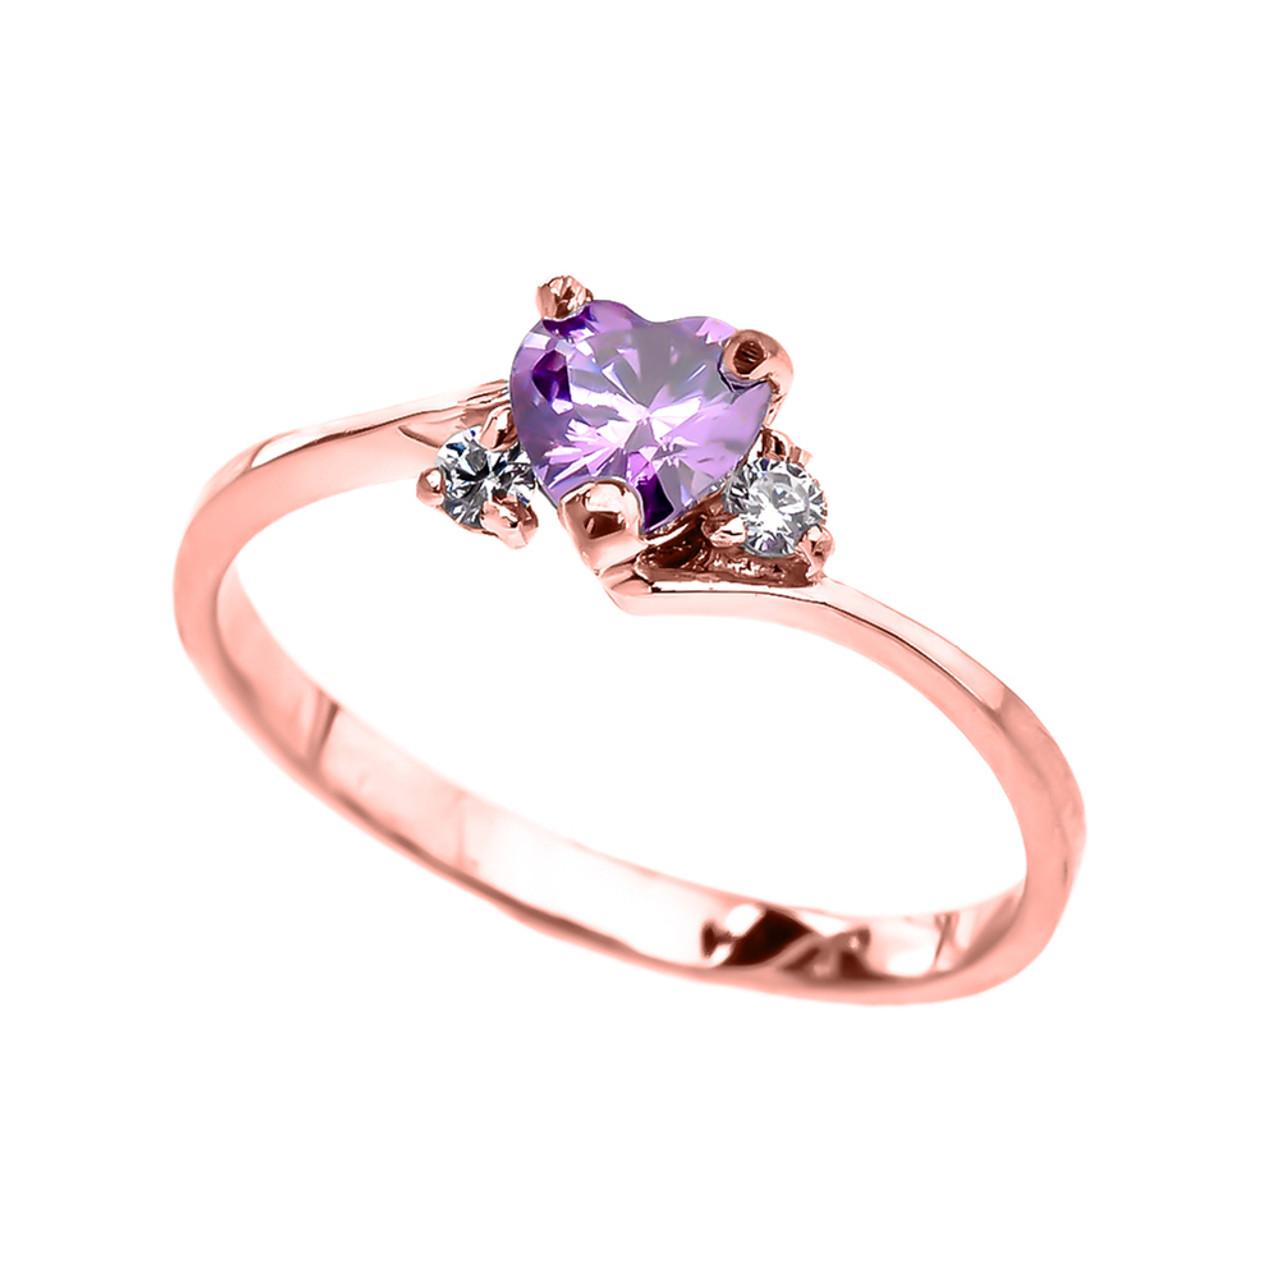 Cz Alexandrite Ring